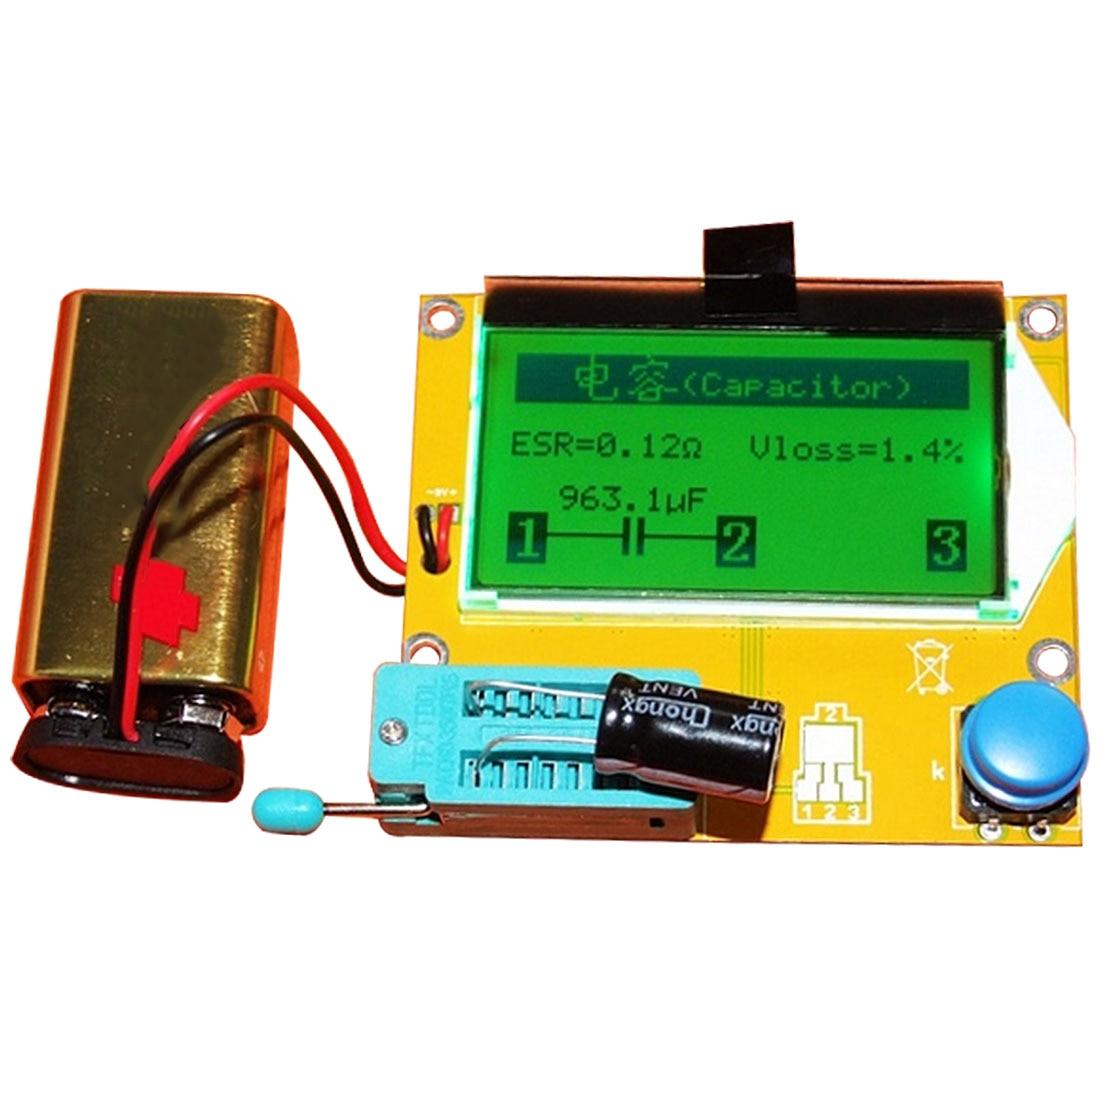 1 stück M328 LCR-T4 12846 LCD Digitale Transistor Tester Meter Hintergrundbeleuchtung Diode Triode Kapazität ESR Meter MOS/PNP/ NPN L/C/R